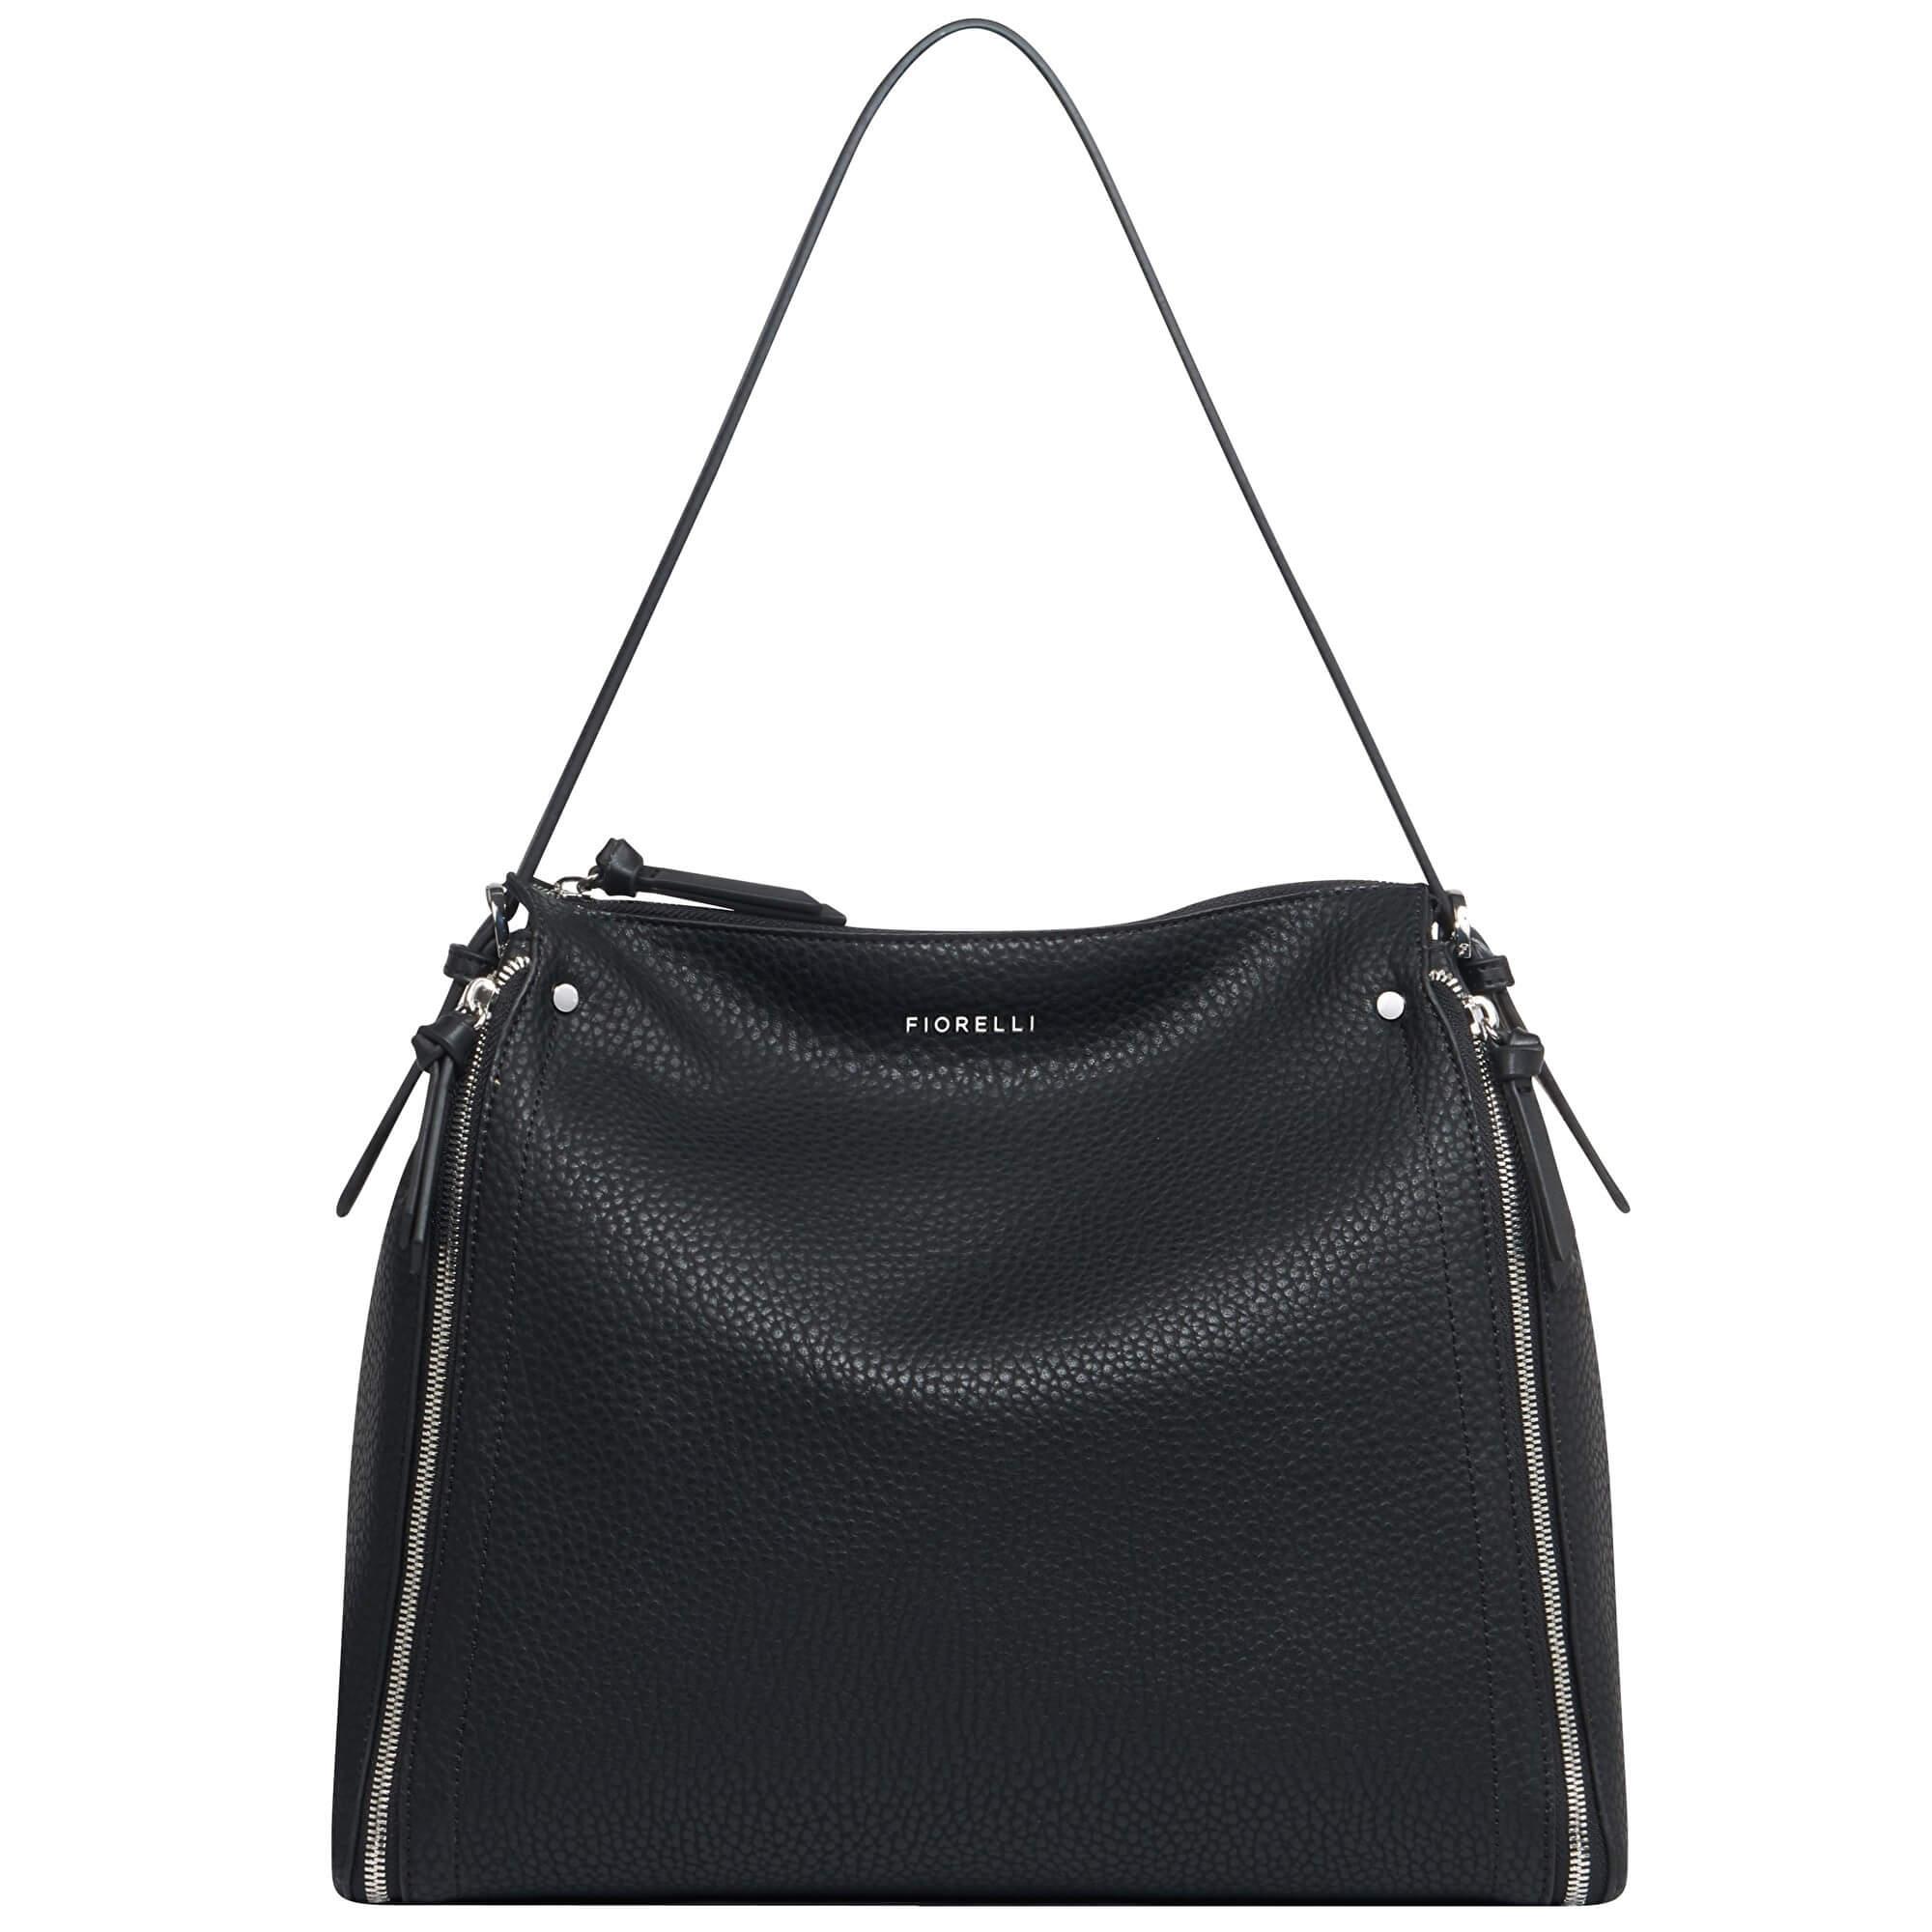 Fiorelli Elegantní kabelka Fleur FWH0247 Black Doprava ZDARMA ... 9105b0a93b7